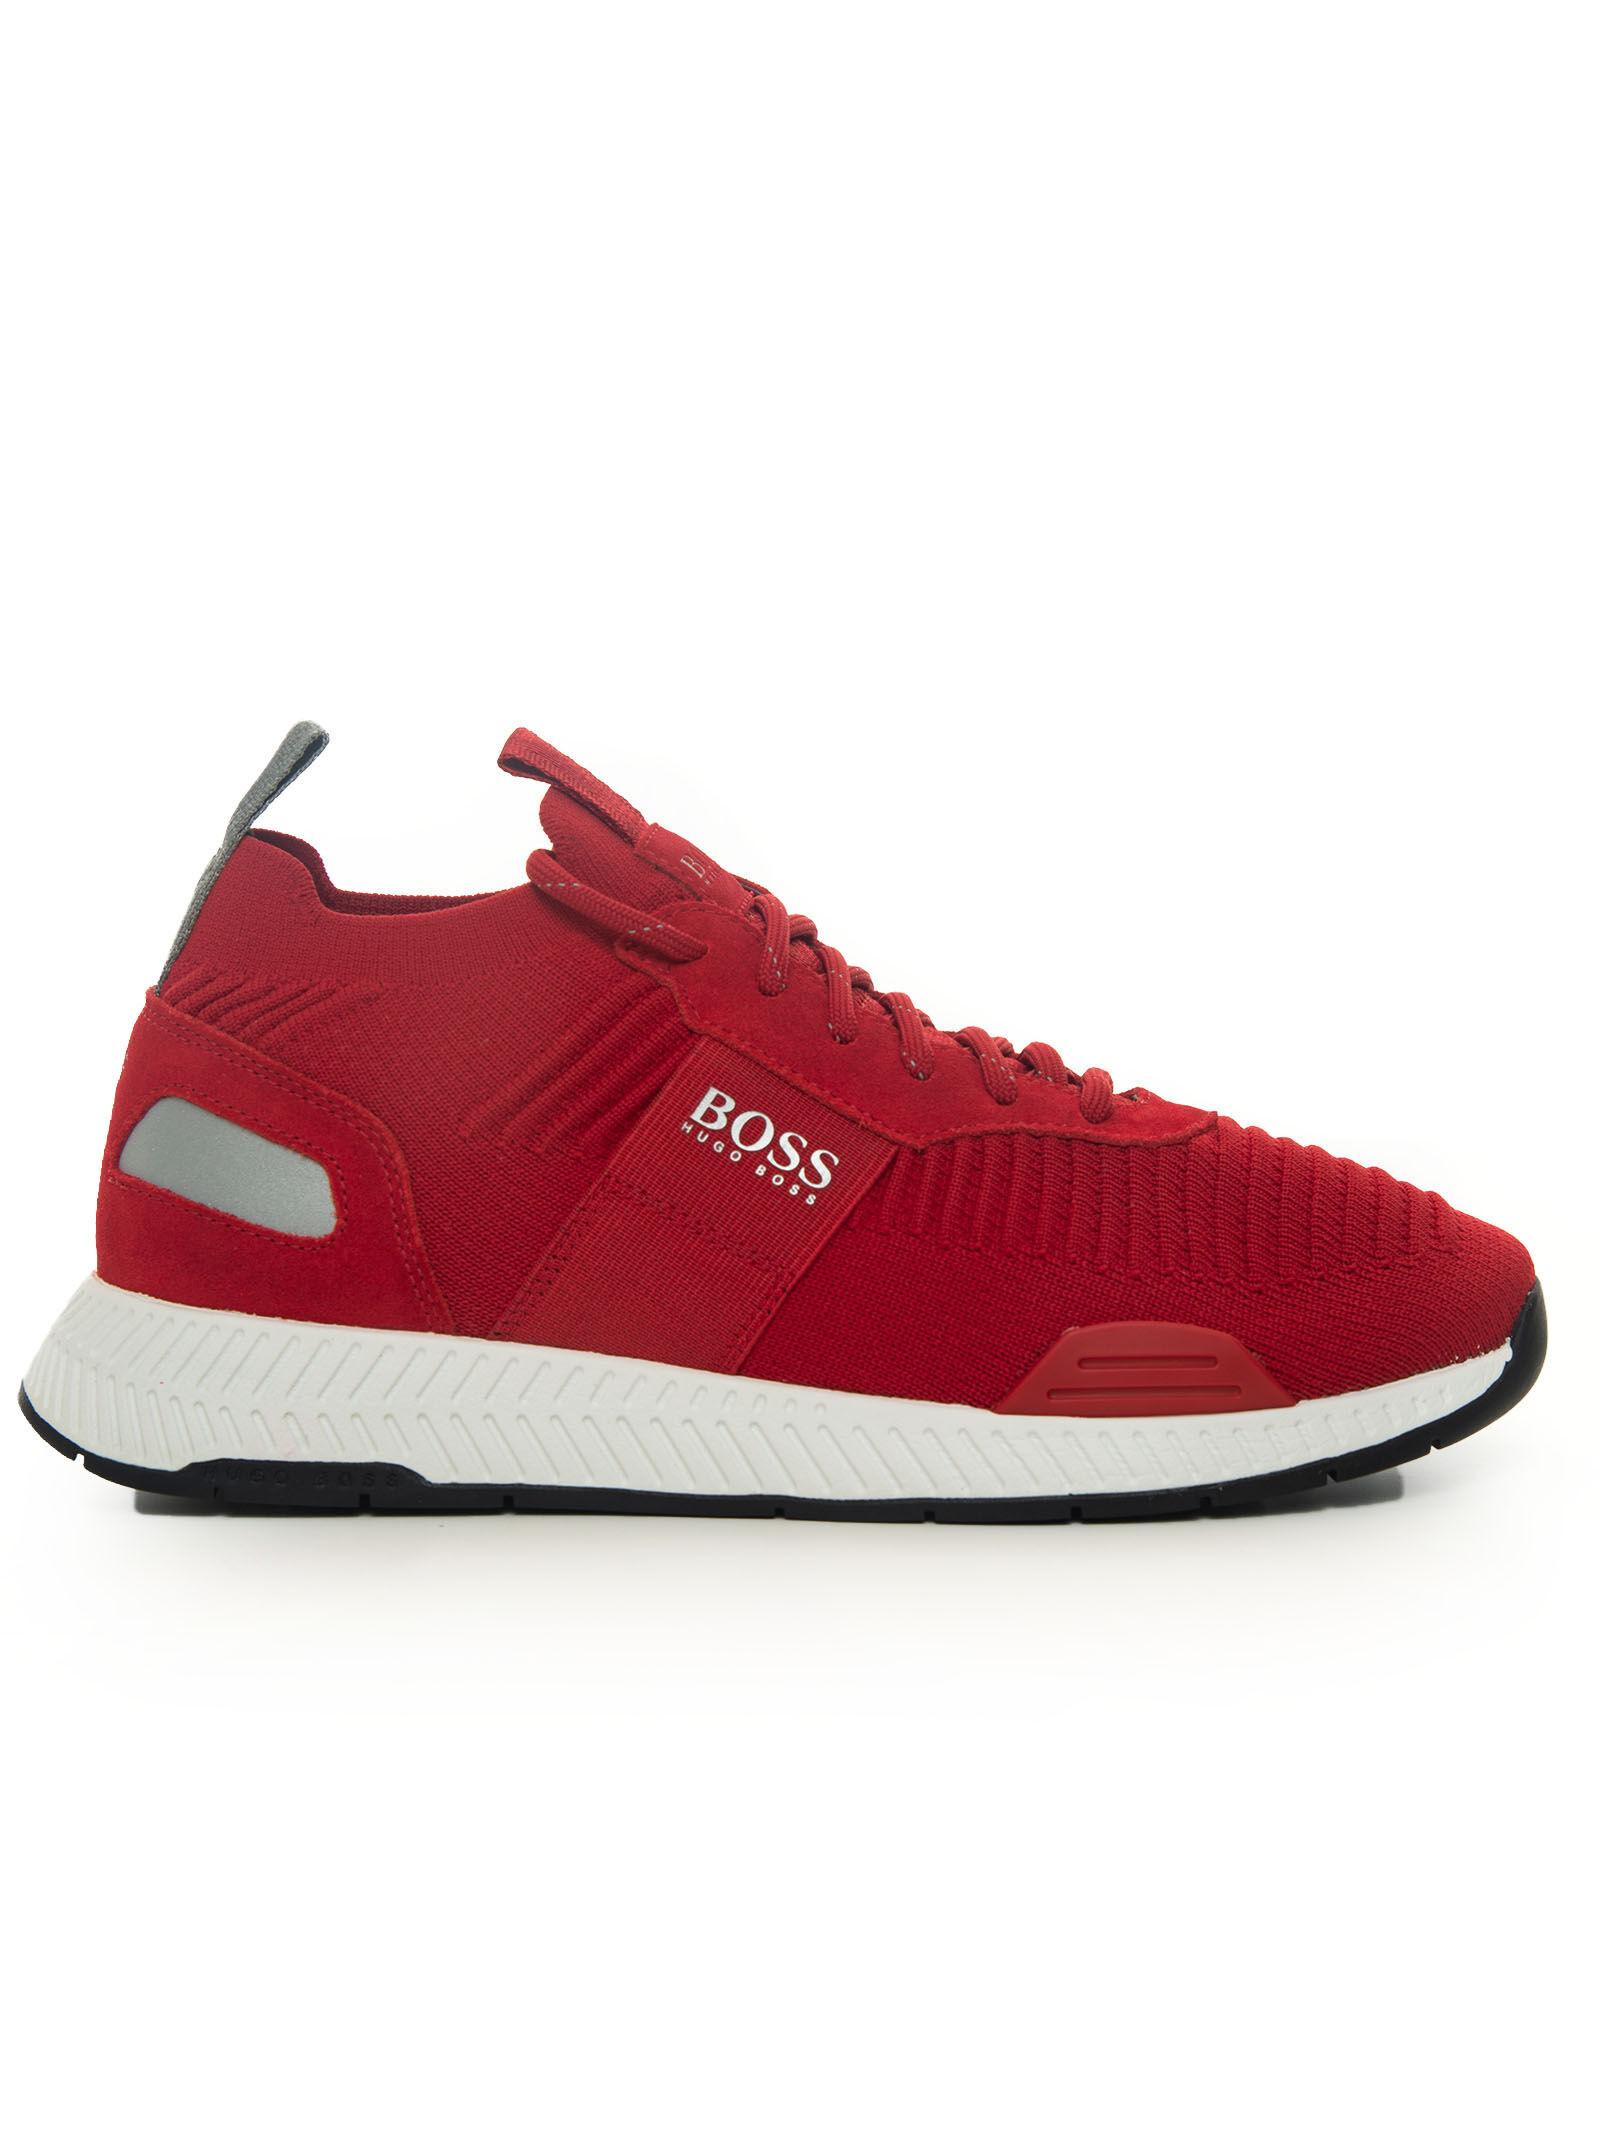 Boss Sneakers Rosso Tela Uomo